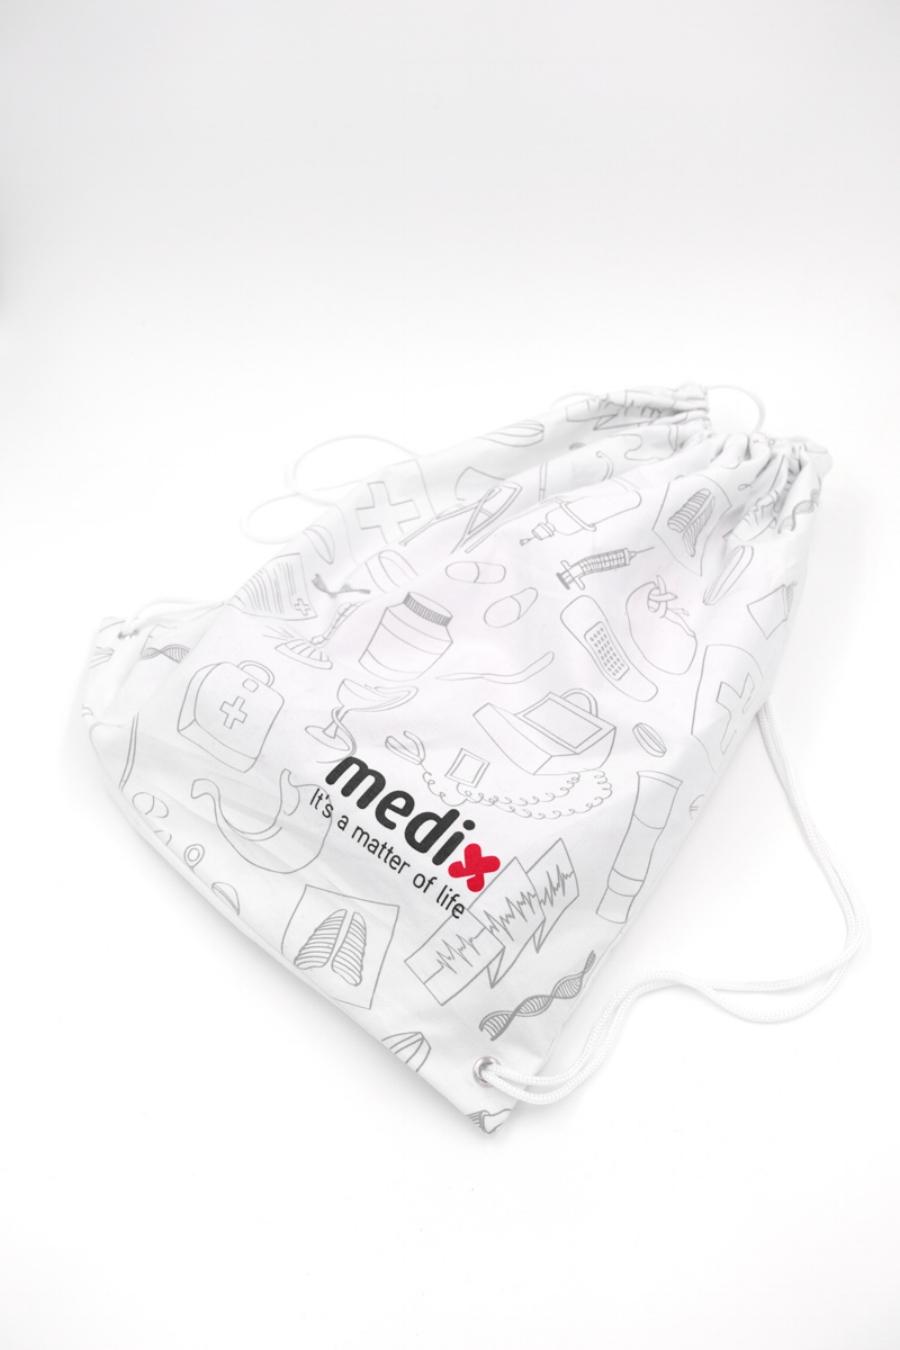 Medix bag collateral